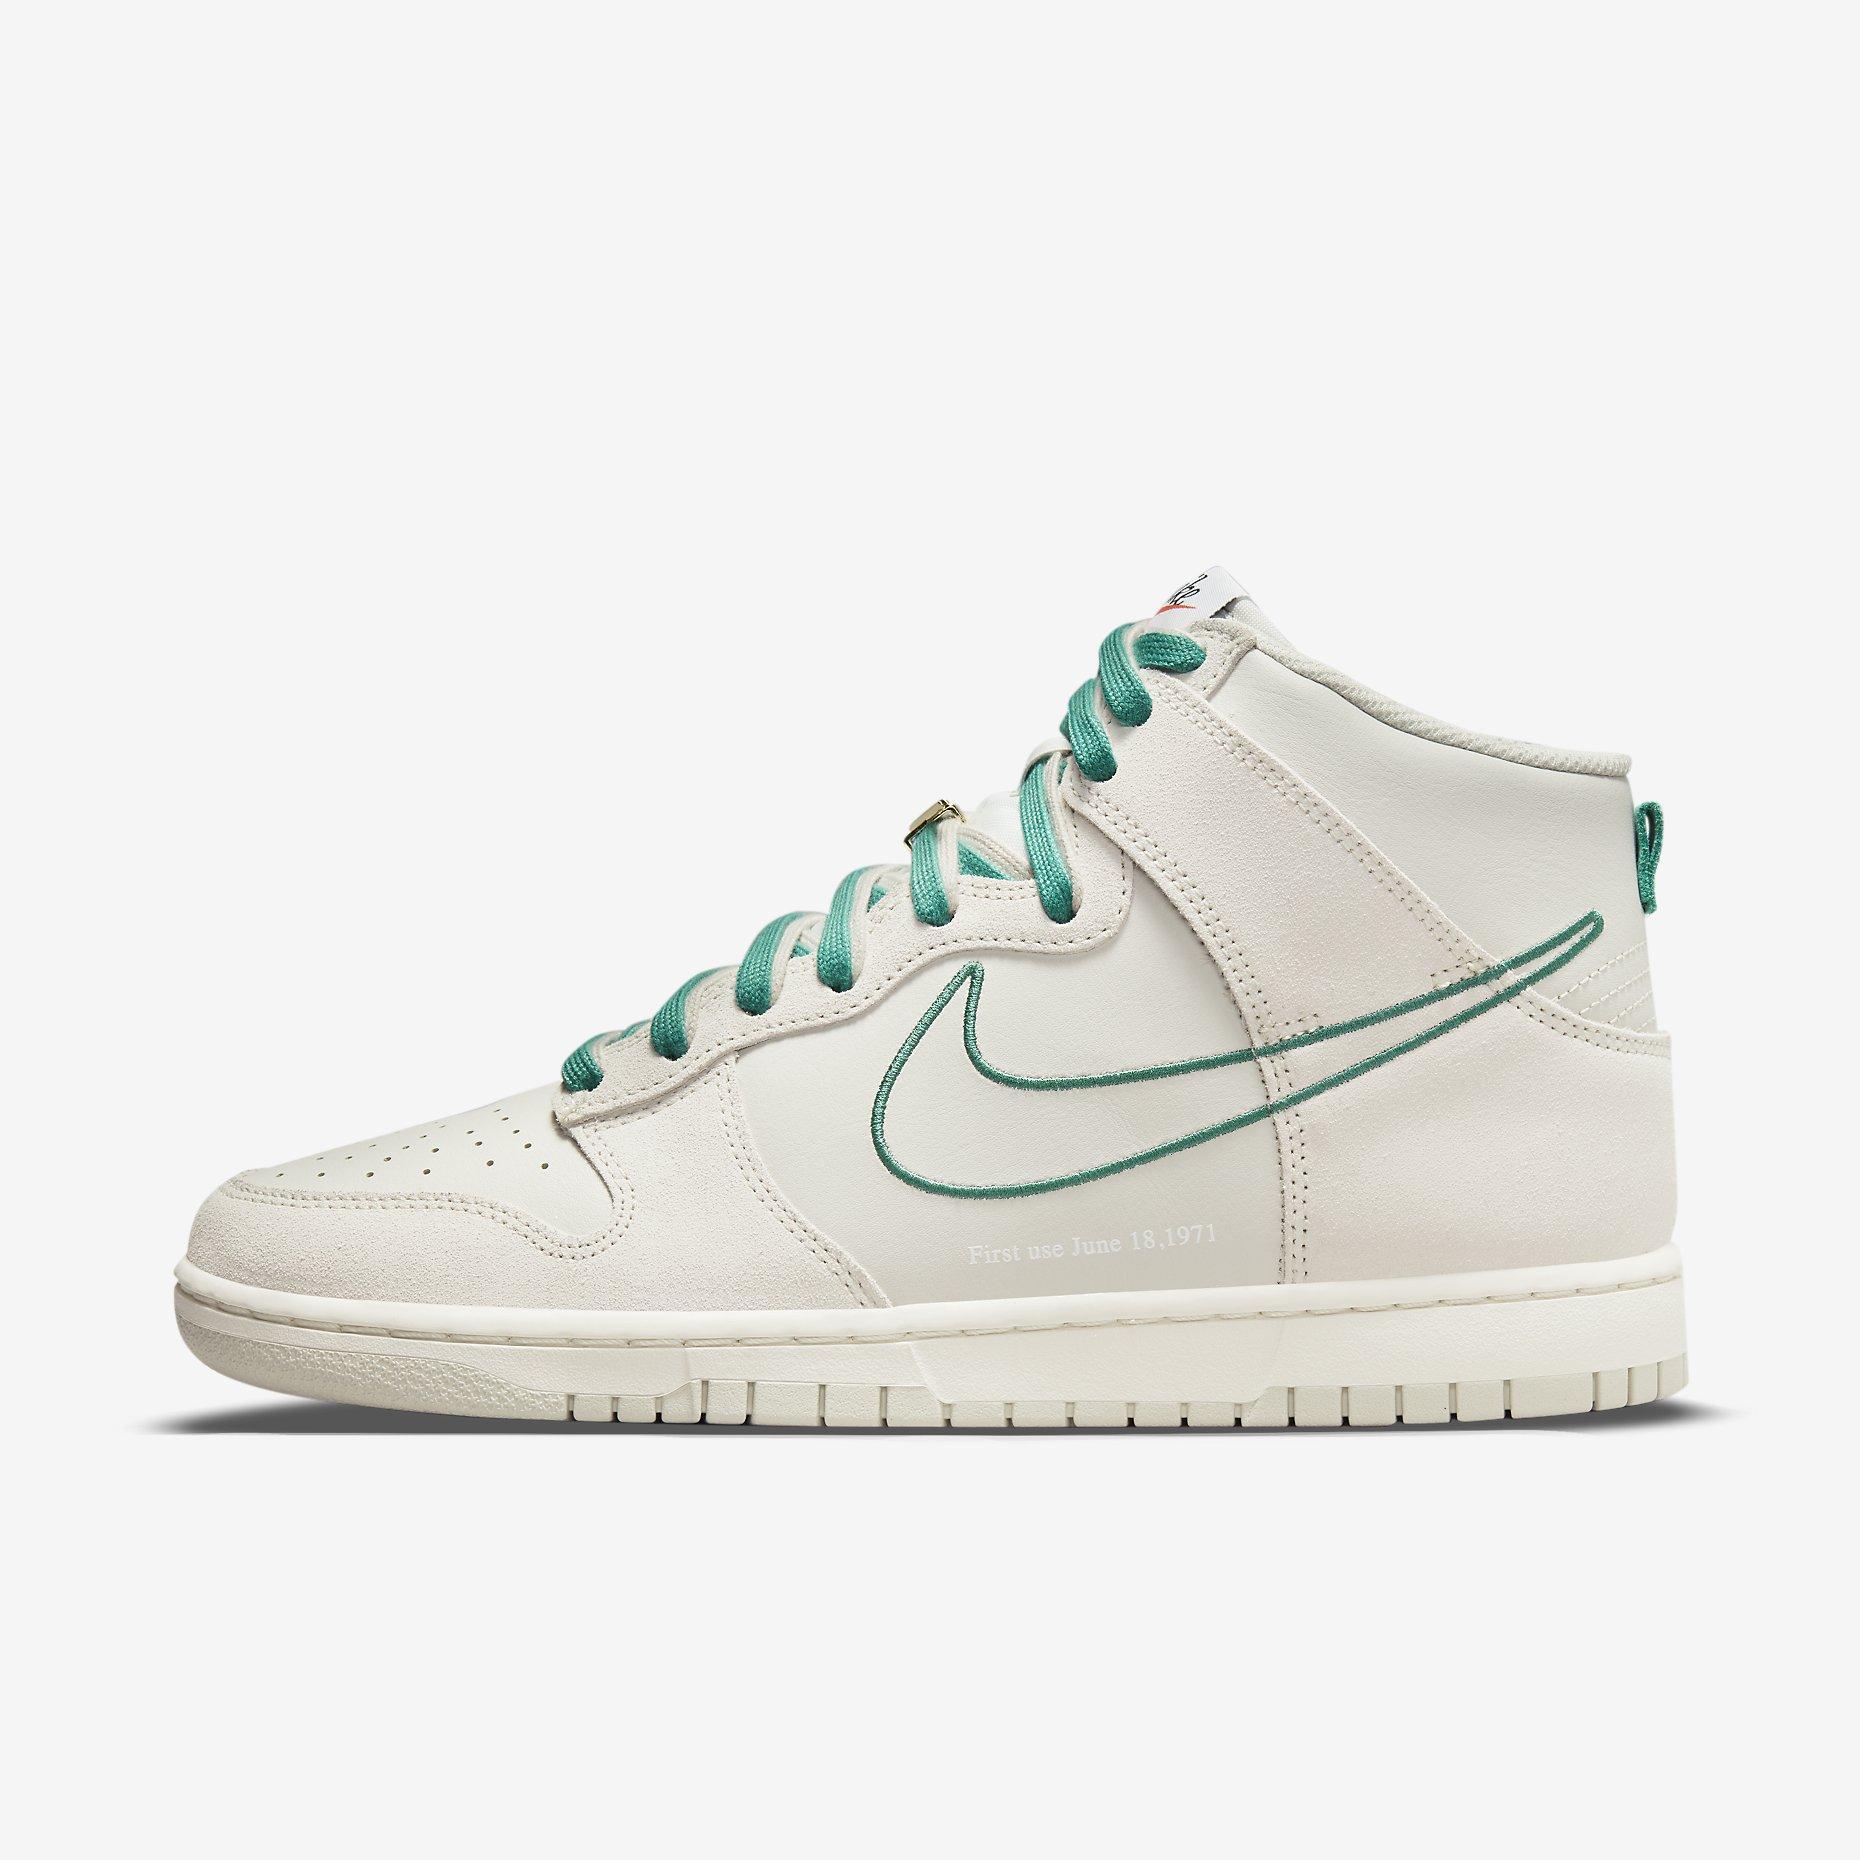 Nike Dunk High SE 'Light Bone/Green Noise' - First Use}